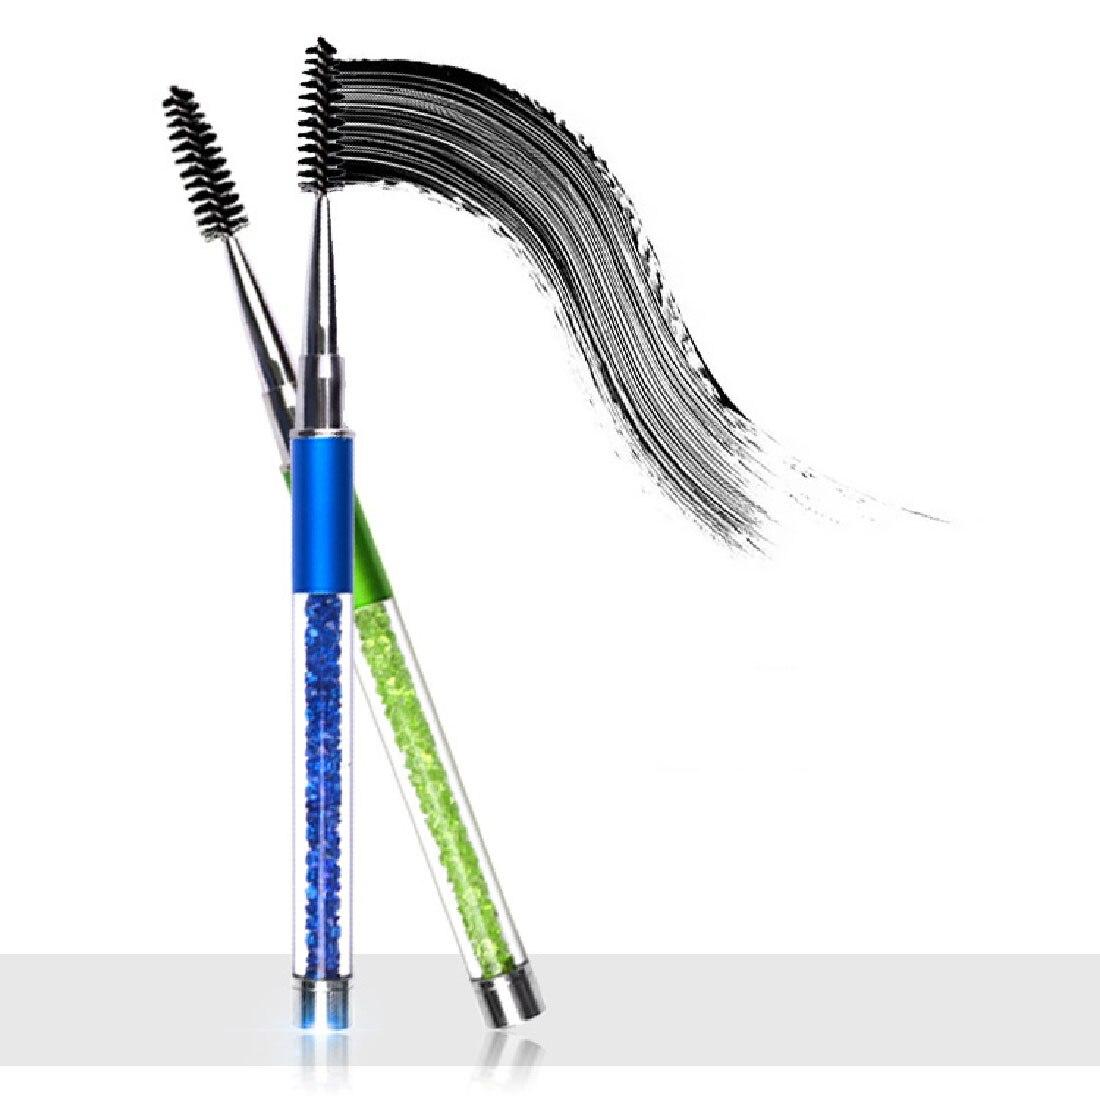 Best Rhinestone Eye Makeup Brush Eyelash Eyebrow Brush Mascara Spiral Wands Applicator Spooler Eyelash Extension Eyelashes Comb